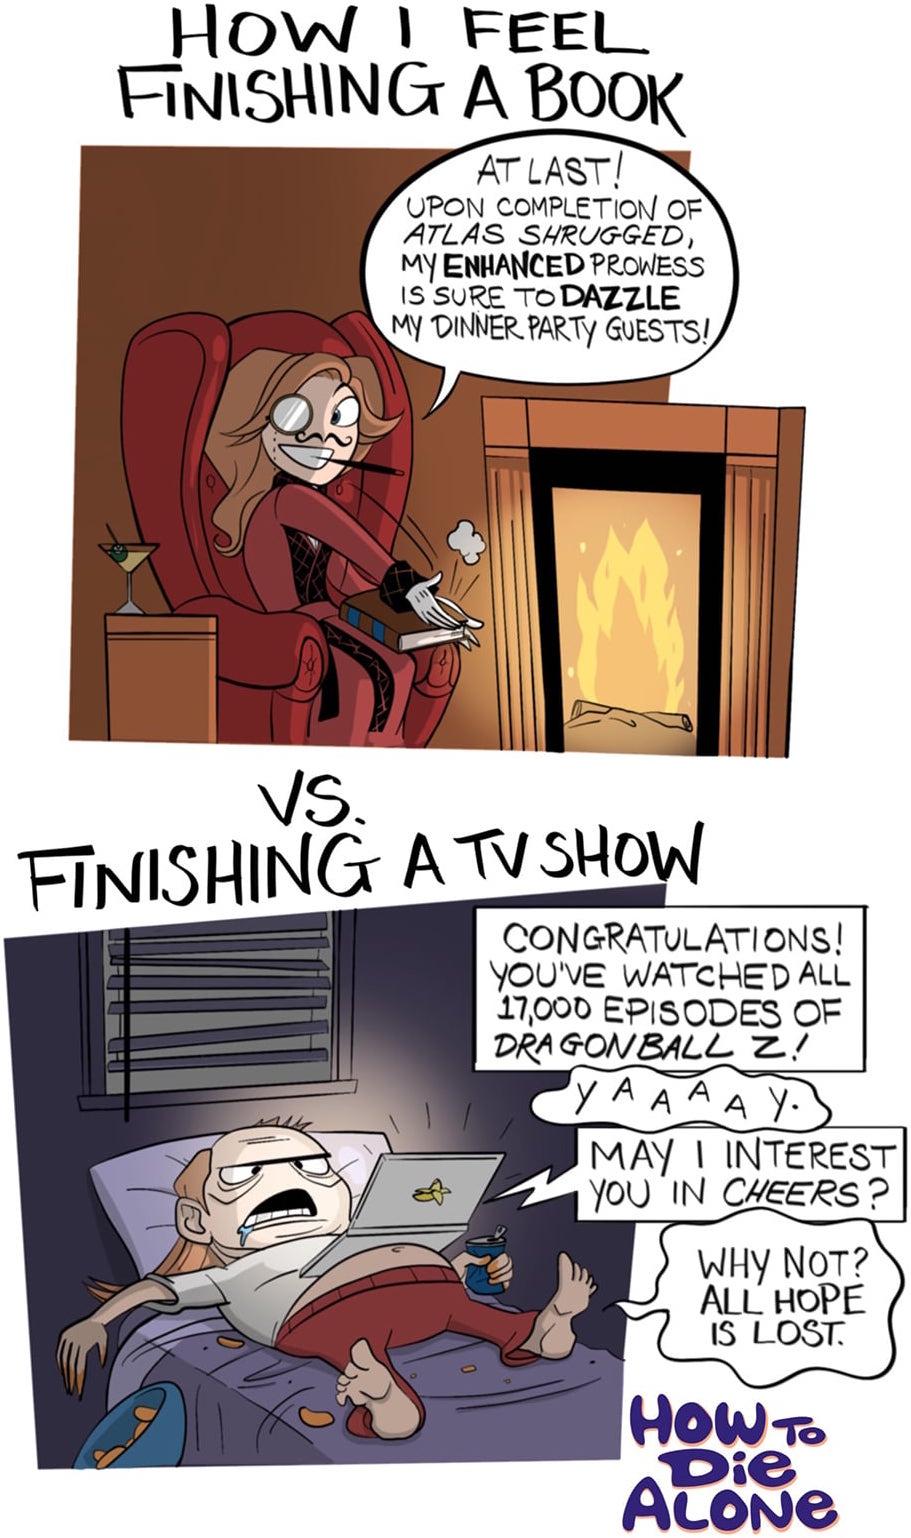 Book Vs TV Show